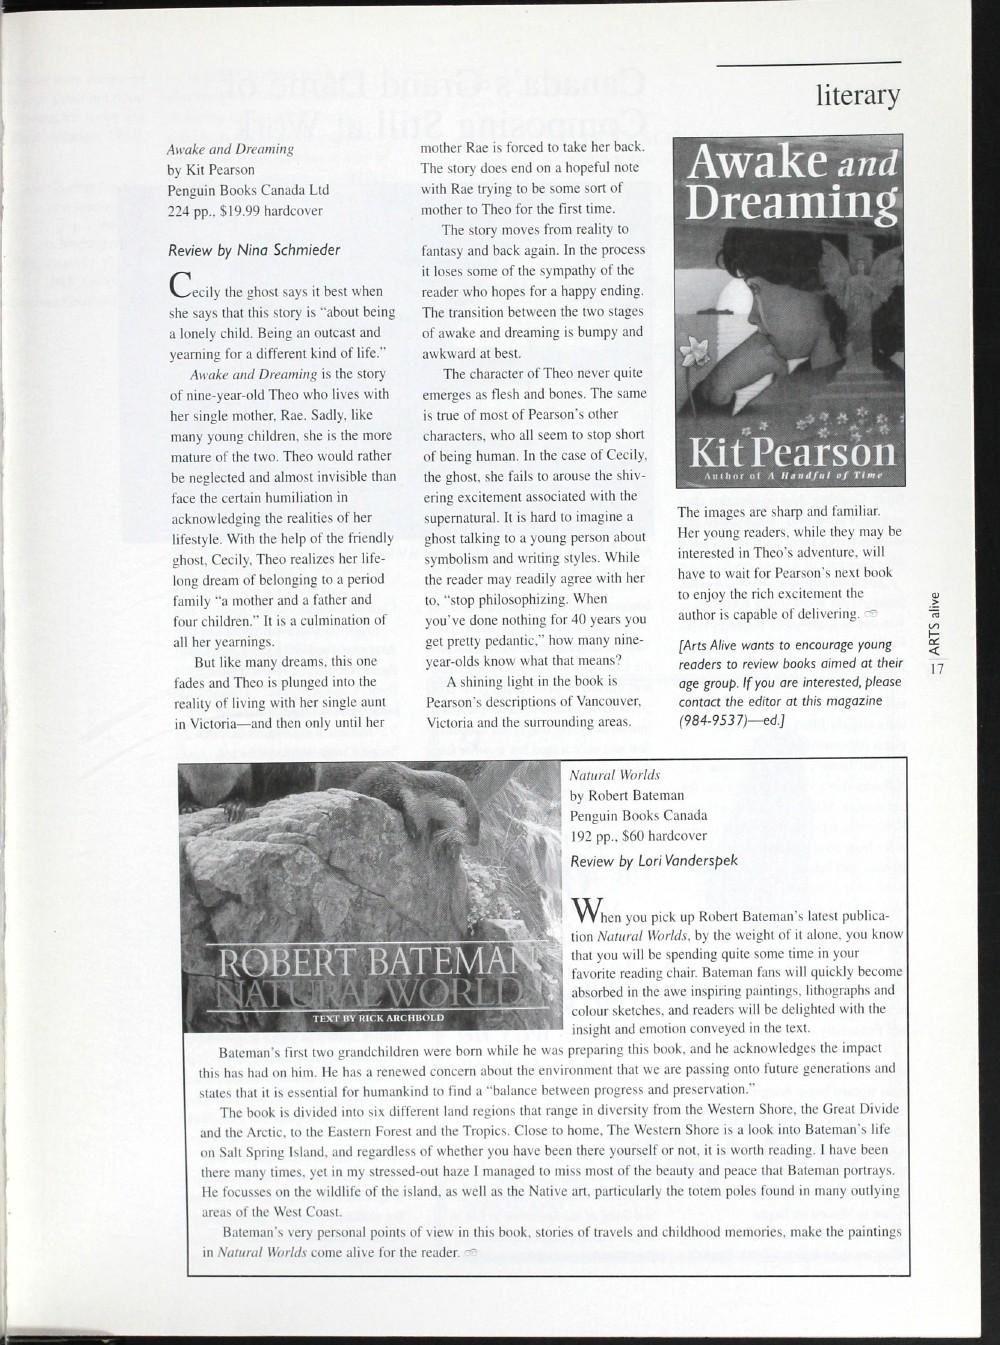 Arts Alive, November/December 1996